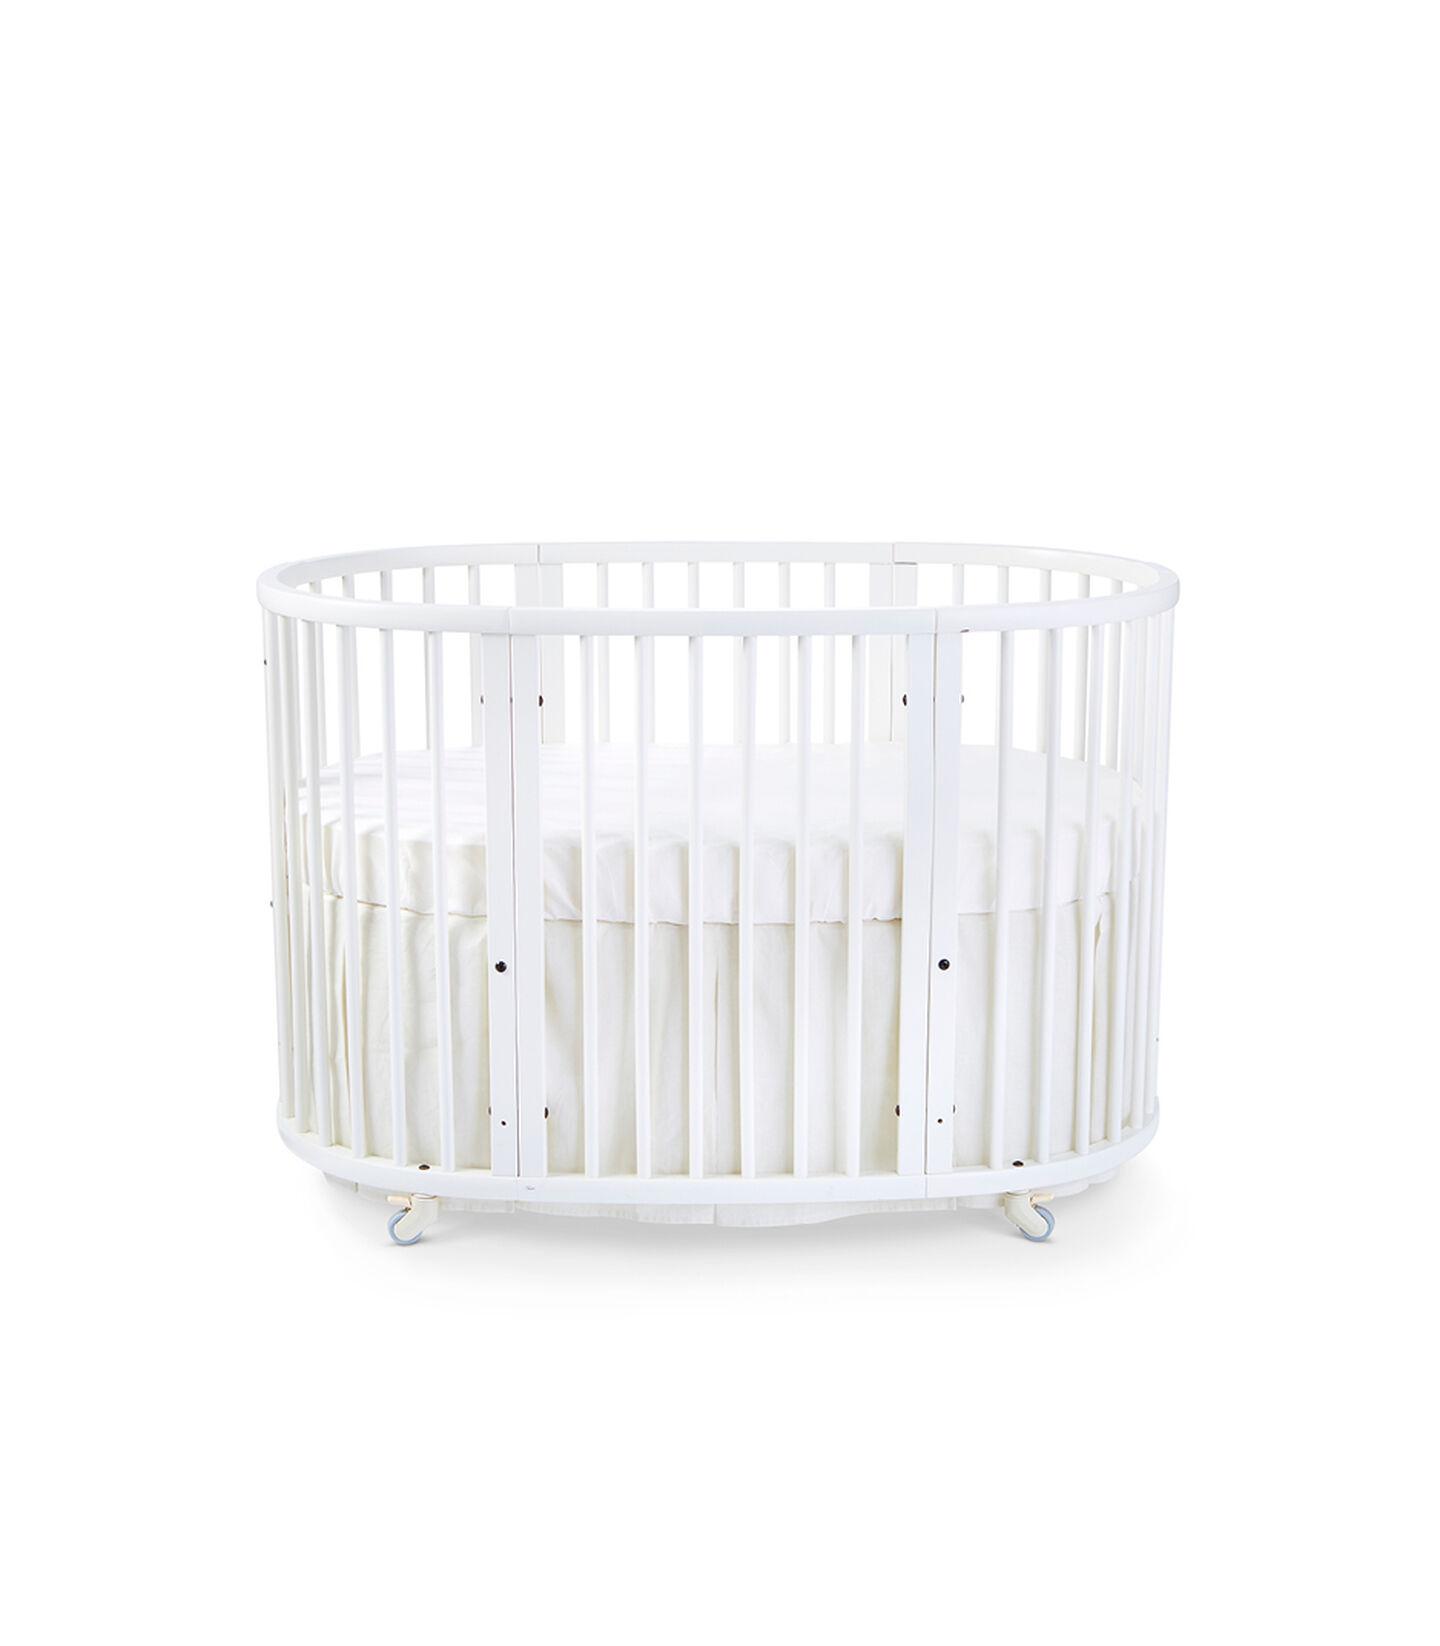 Stokke® Sleepi™ Bed, White. Bed Skirt Natural. US only.